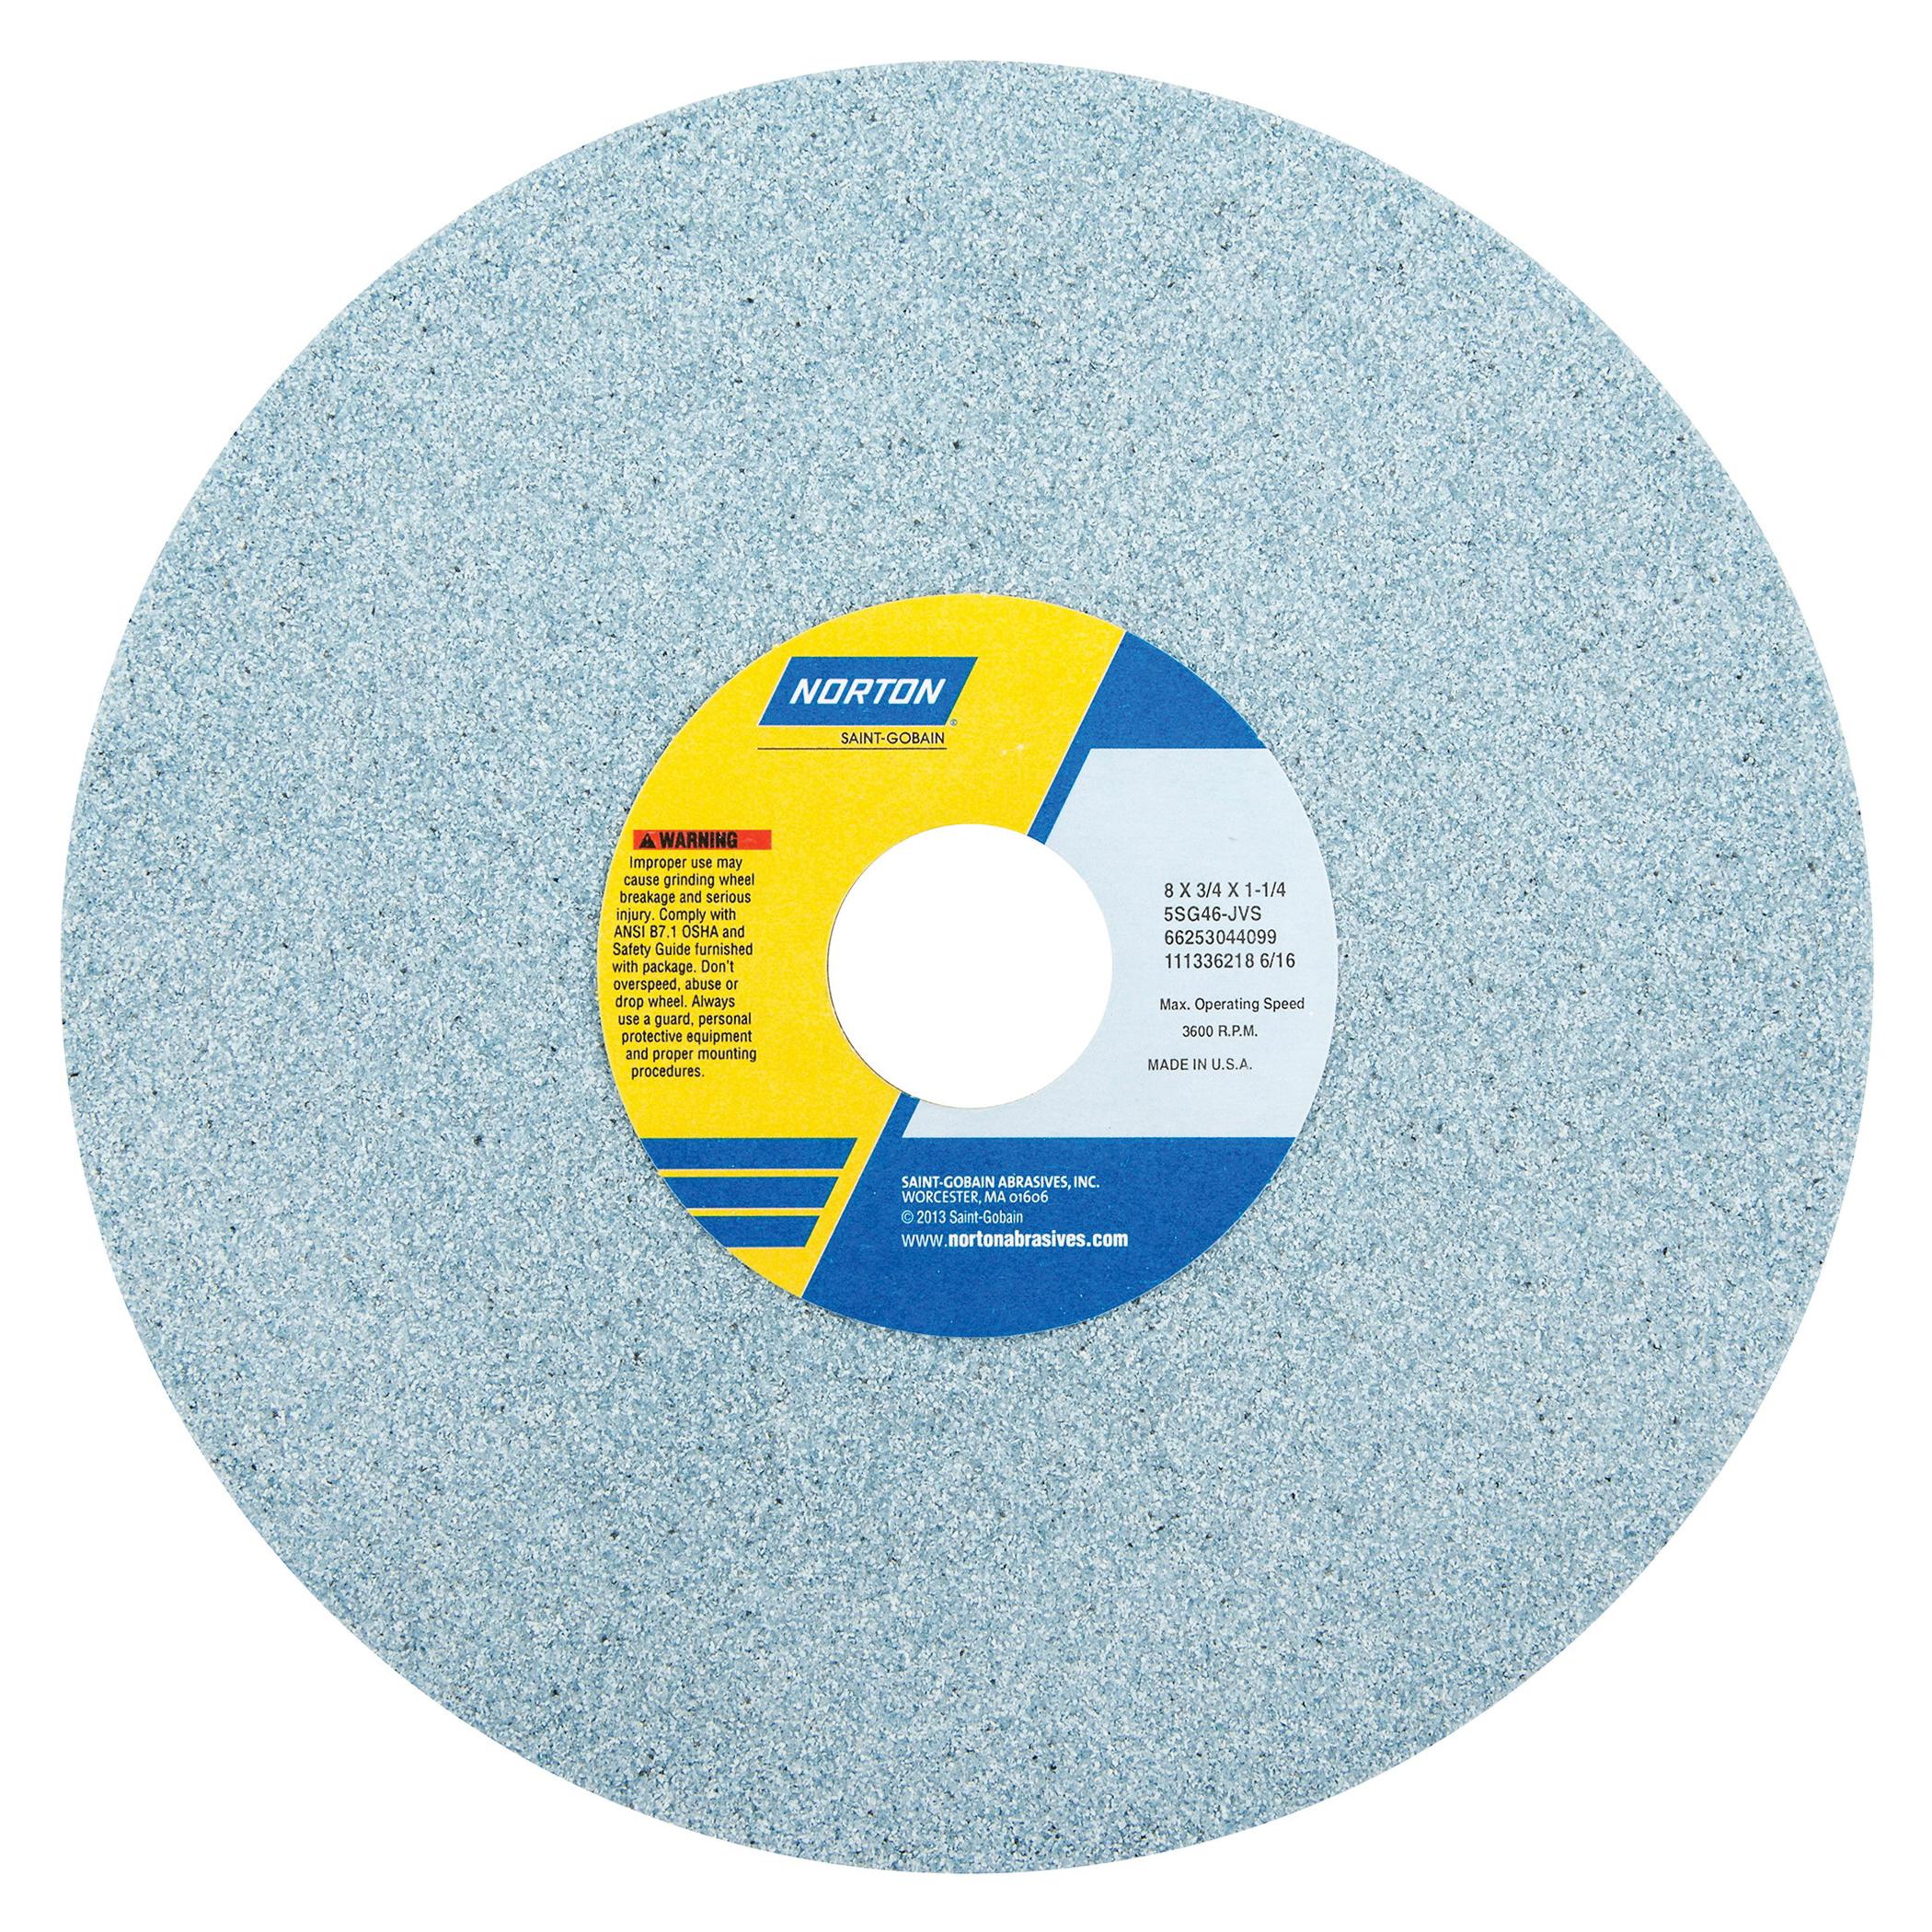 Norton® 66253044099 5SG Straight Toolroom Wheel, 8 in Dia x 3/4 in THK, 1-1/4 in Center Hole, 46 Grit, Ceramic Alumina/Friable Aluminum Oxide Abrasive